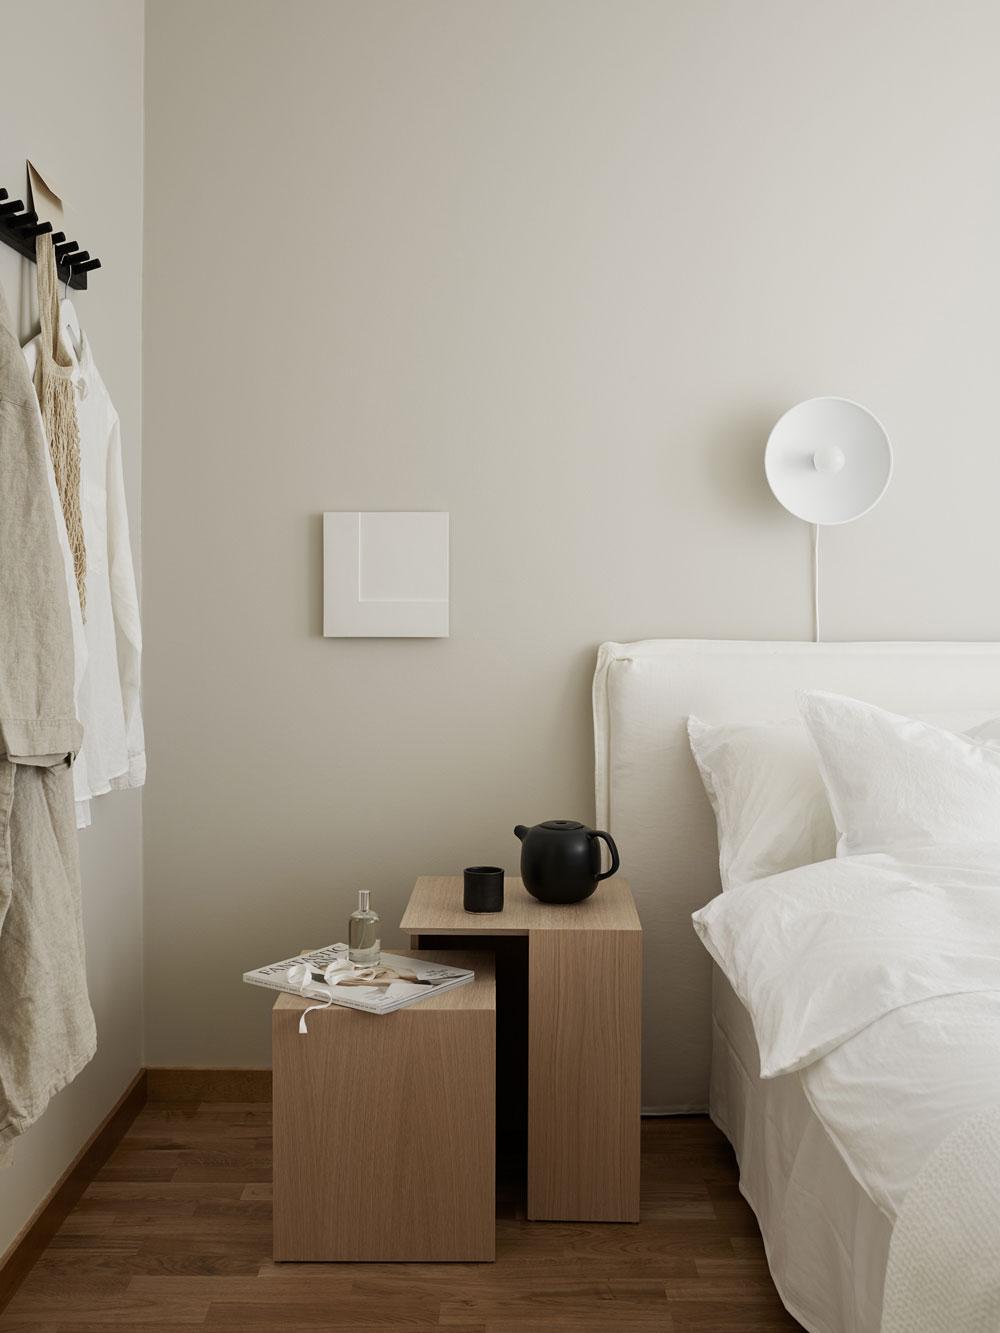 A serene organic and minimal interior by sundling kickén